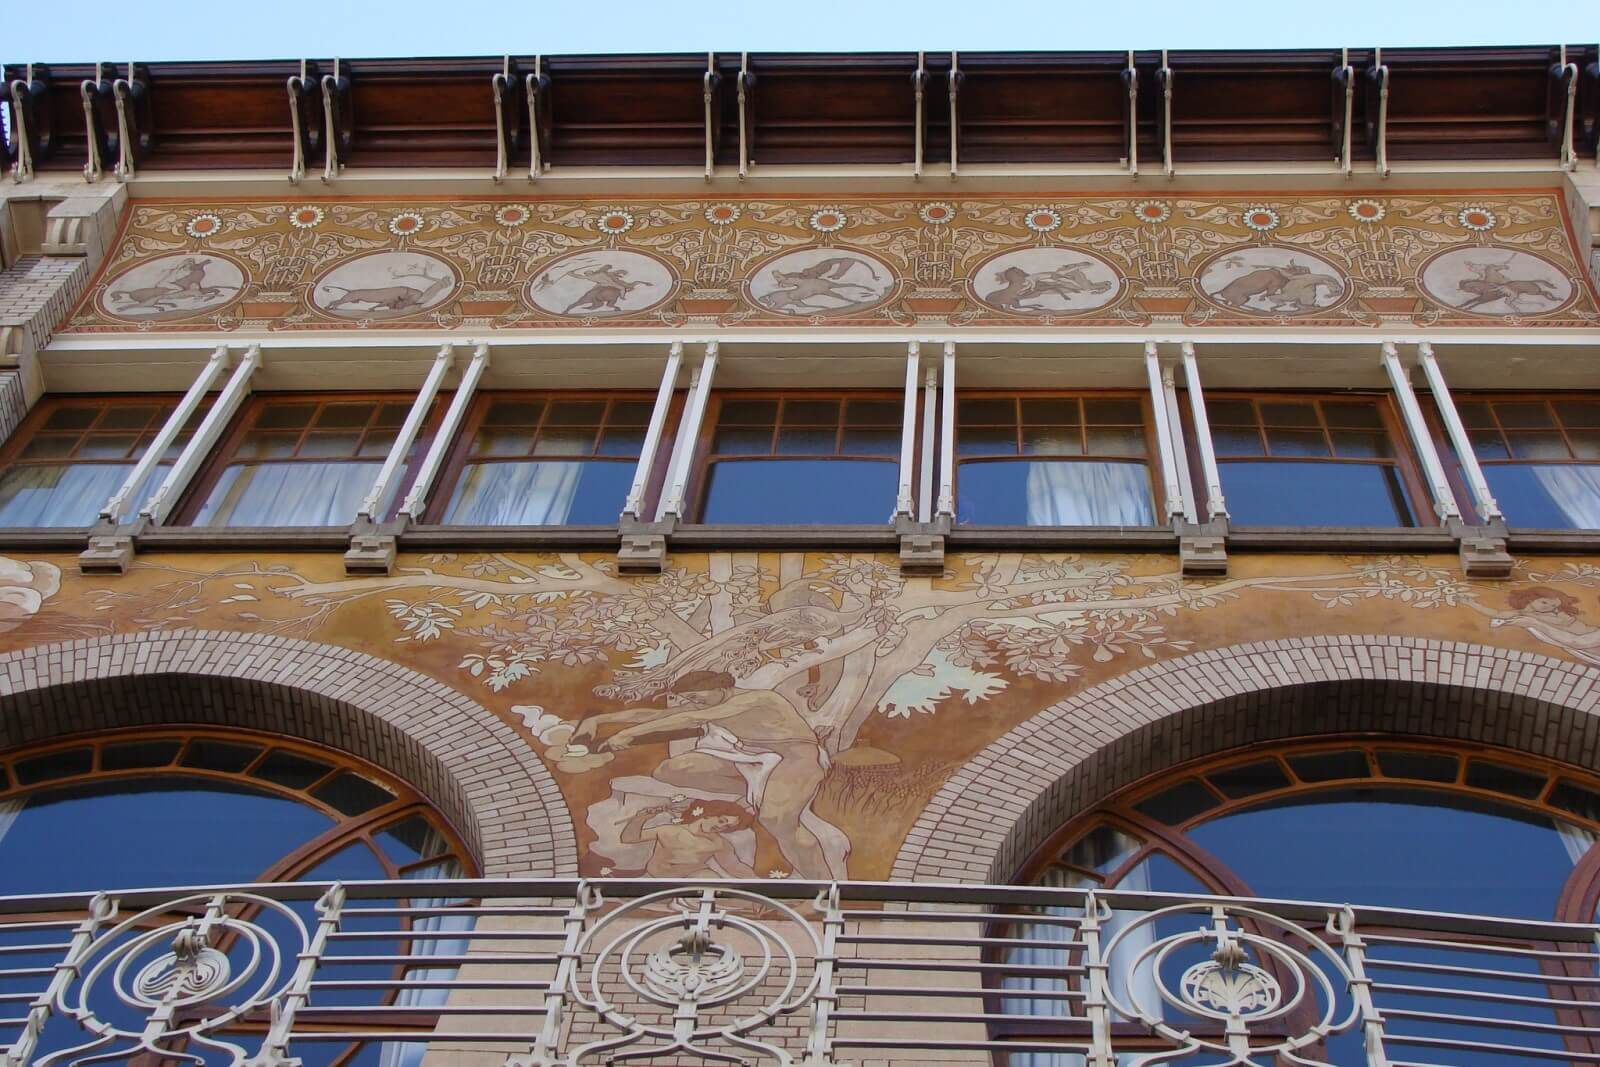 Hotel Ciamberlani - Paul Hankar - Art Nouveau Brussels